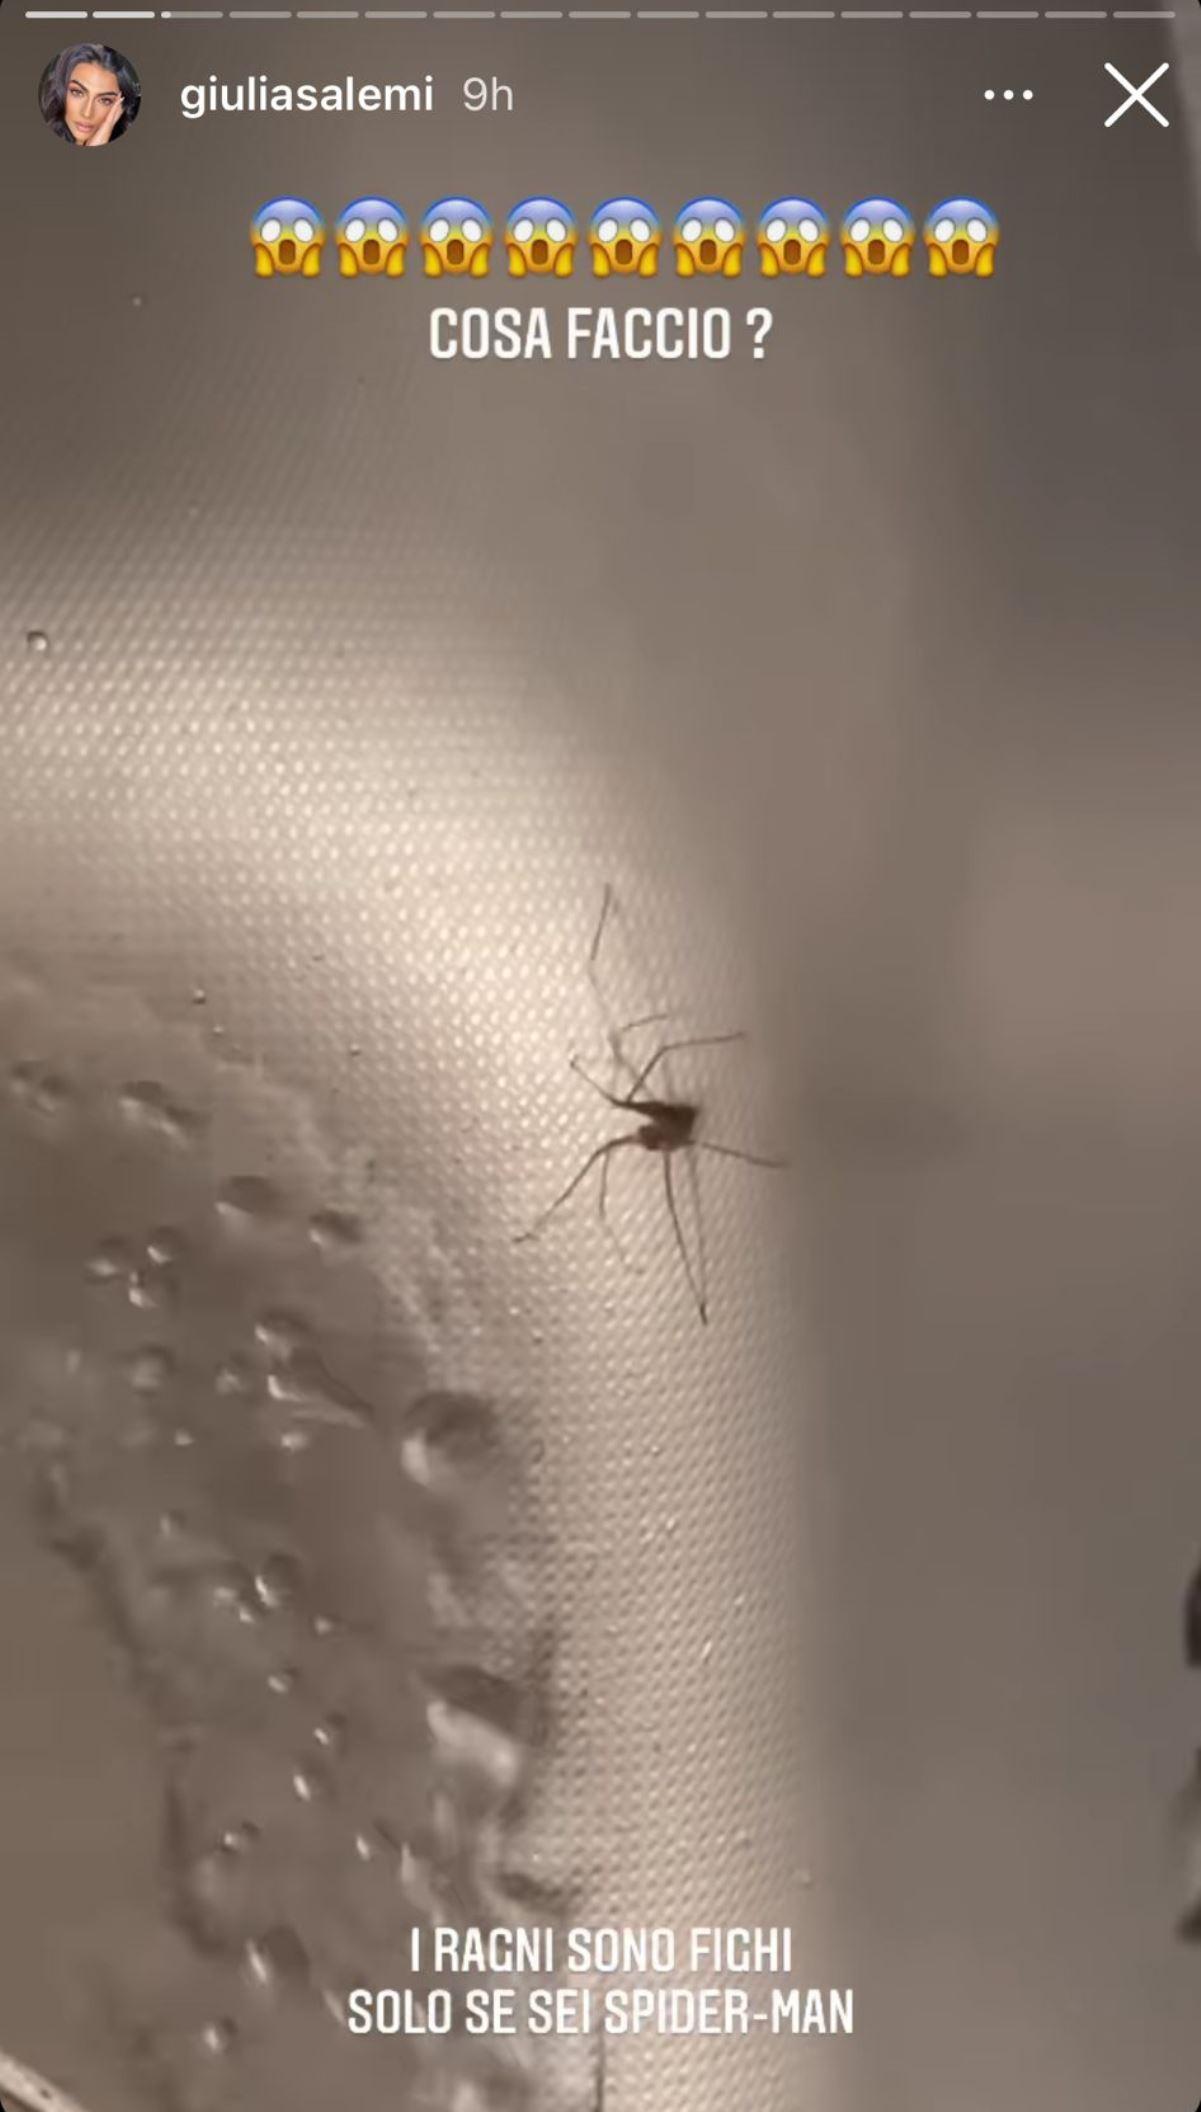 giulia salemi paura ragni